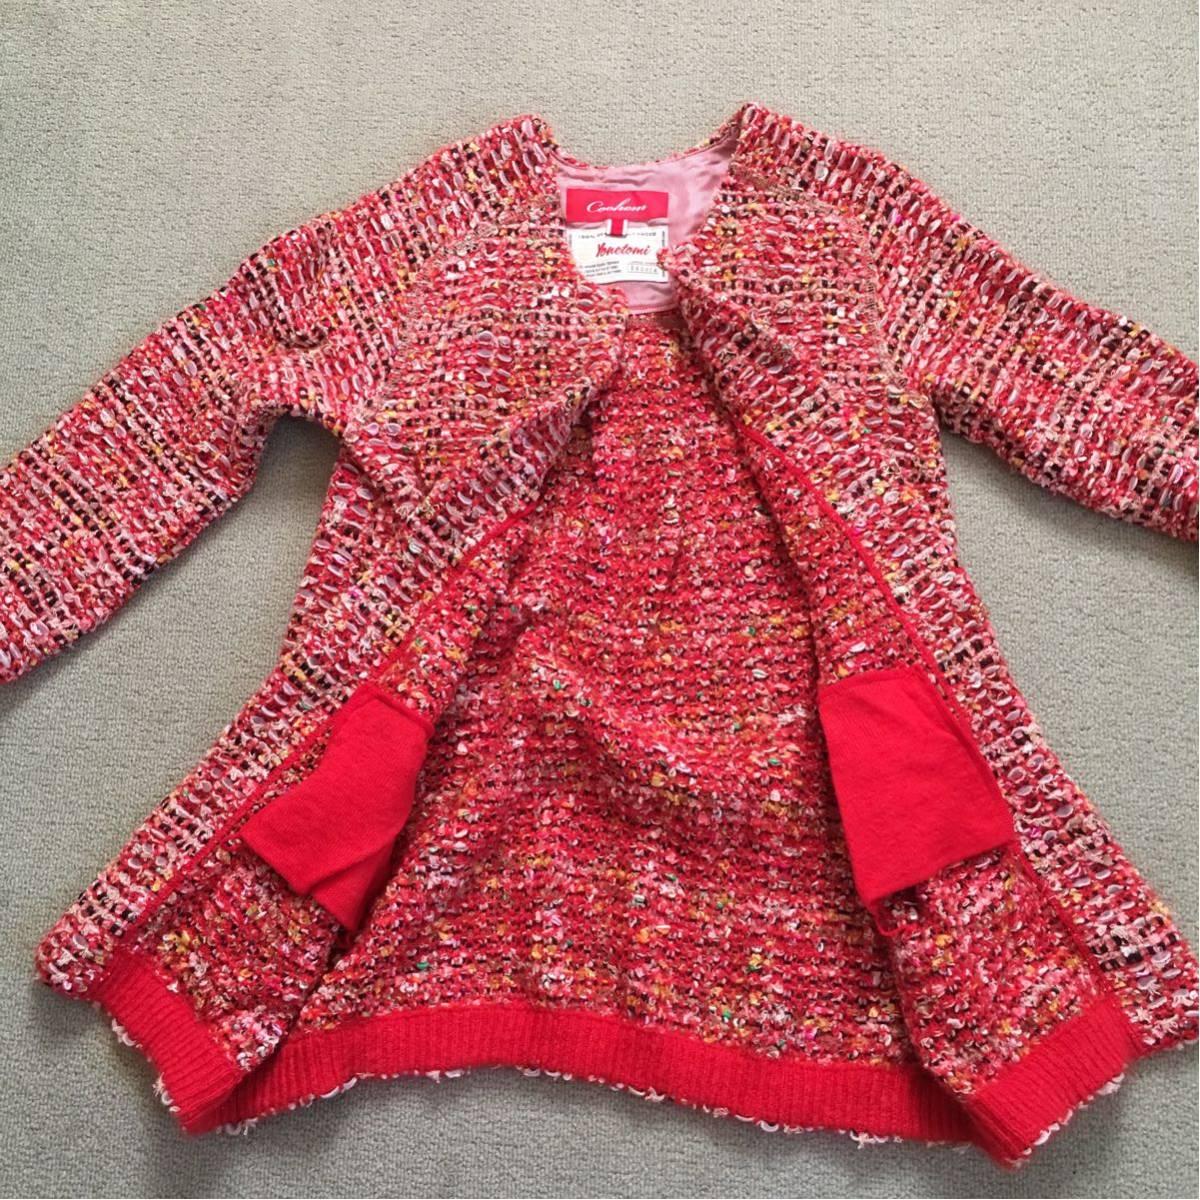 k 美品 Coohem(コーヘン) 個性的なツイードコート 赤系 36サイズ 可愛いジャケットコート_画像4